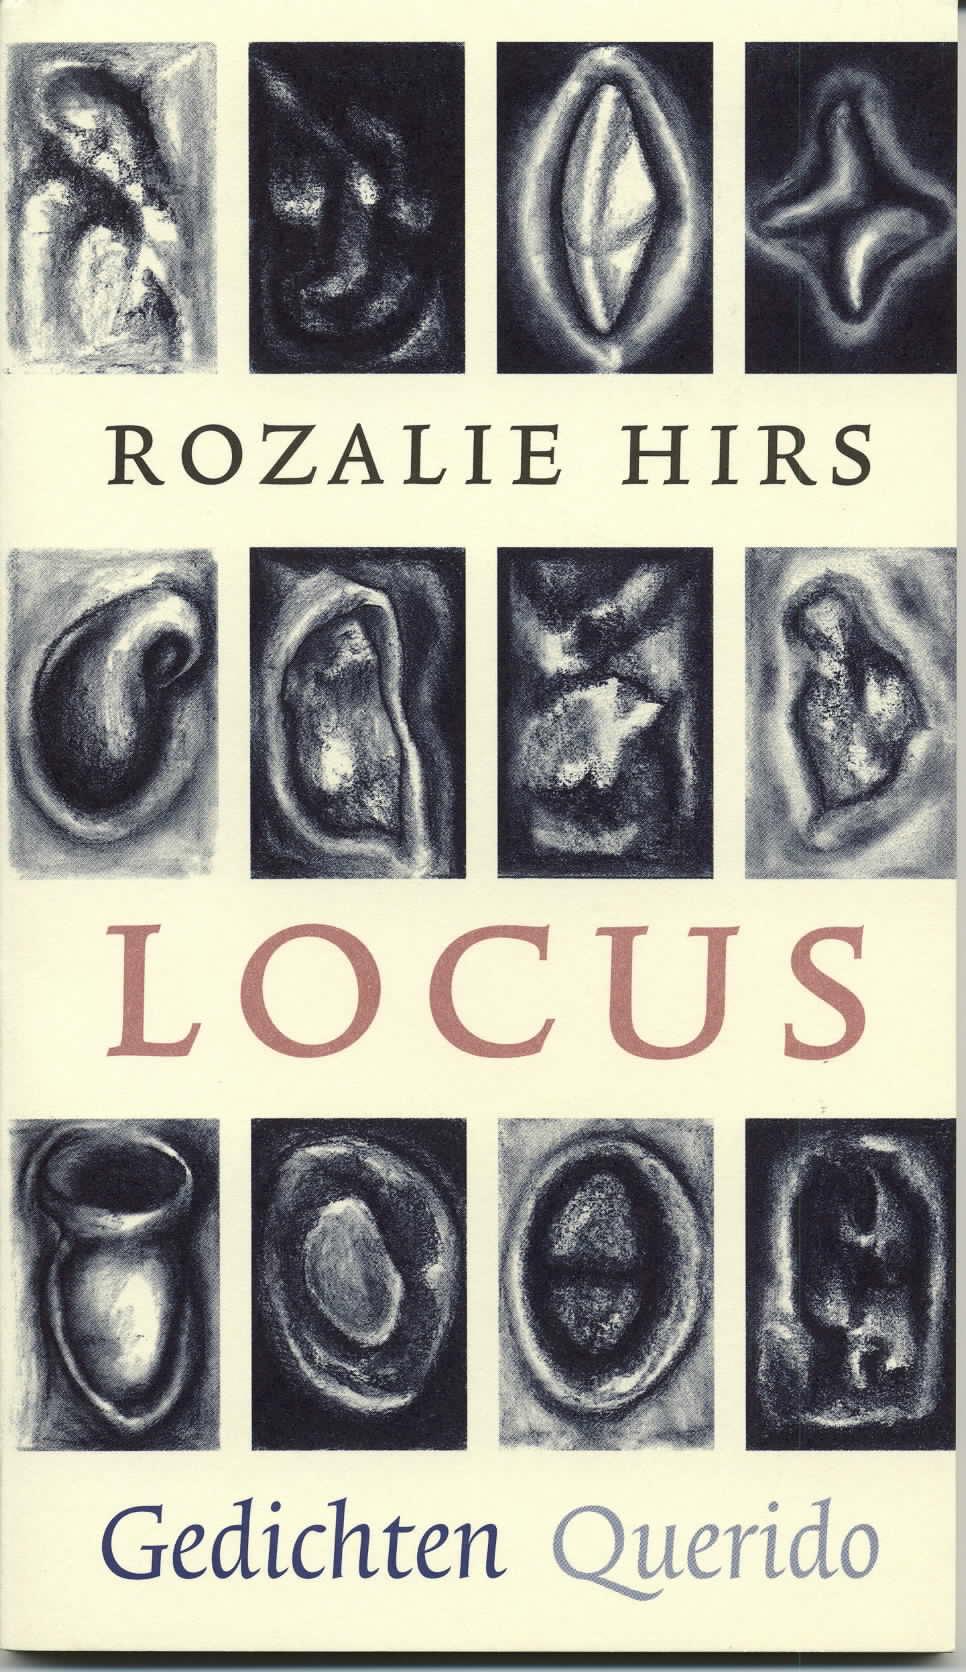 Rozalie Hirs: Locus (Amsterdam: Singeluitgeverijen|Querido, 1998)